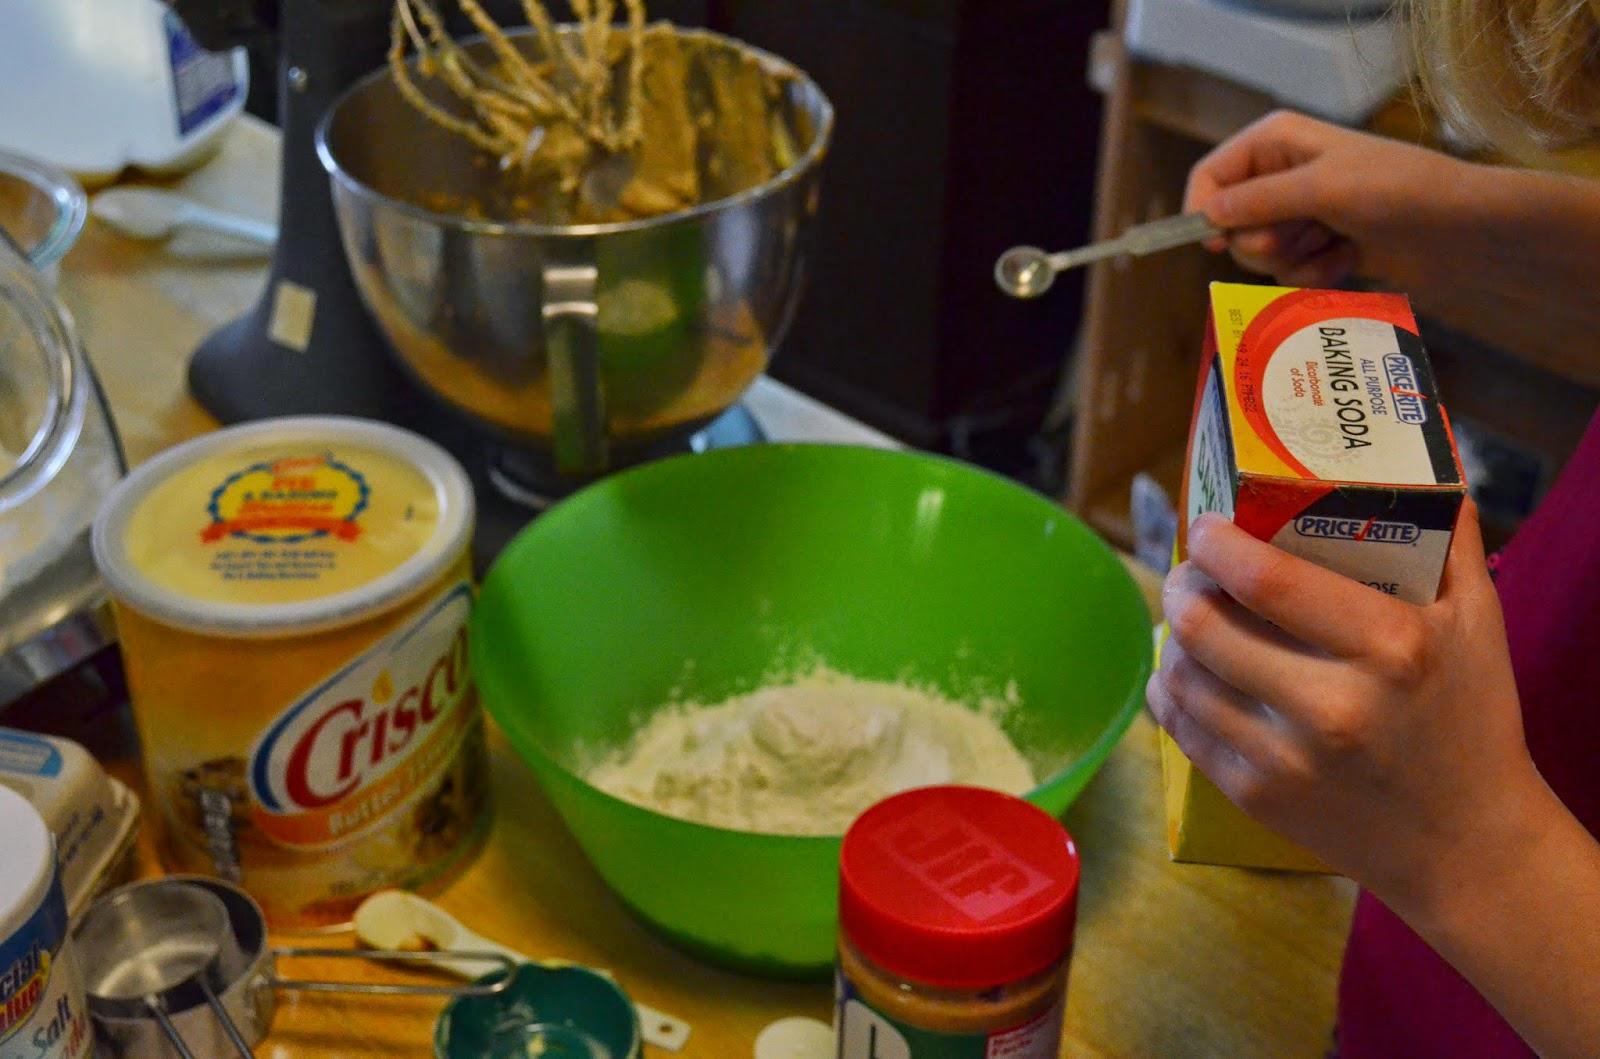 Peanut Butter Criss Cross Cookies- my grandma's recipe! #HolidayAdvantEdge #ad #recipe #cookies